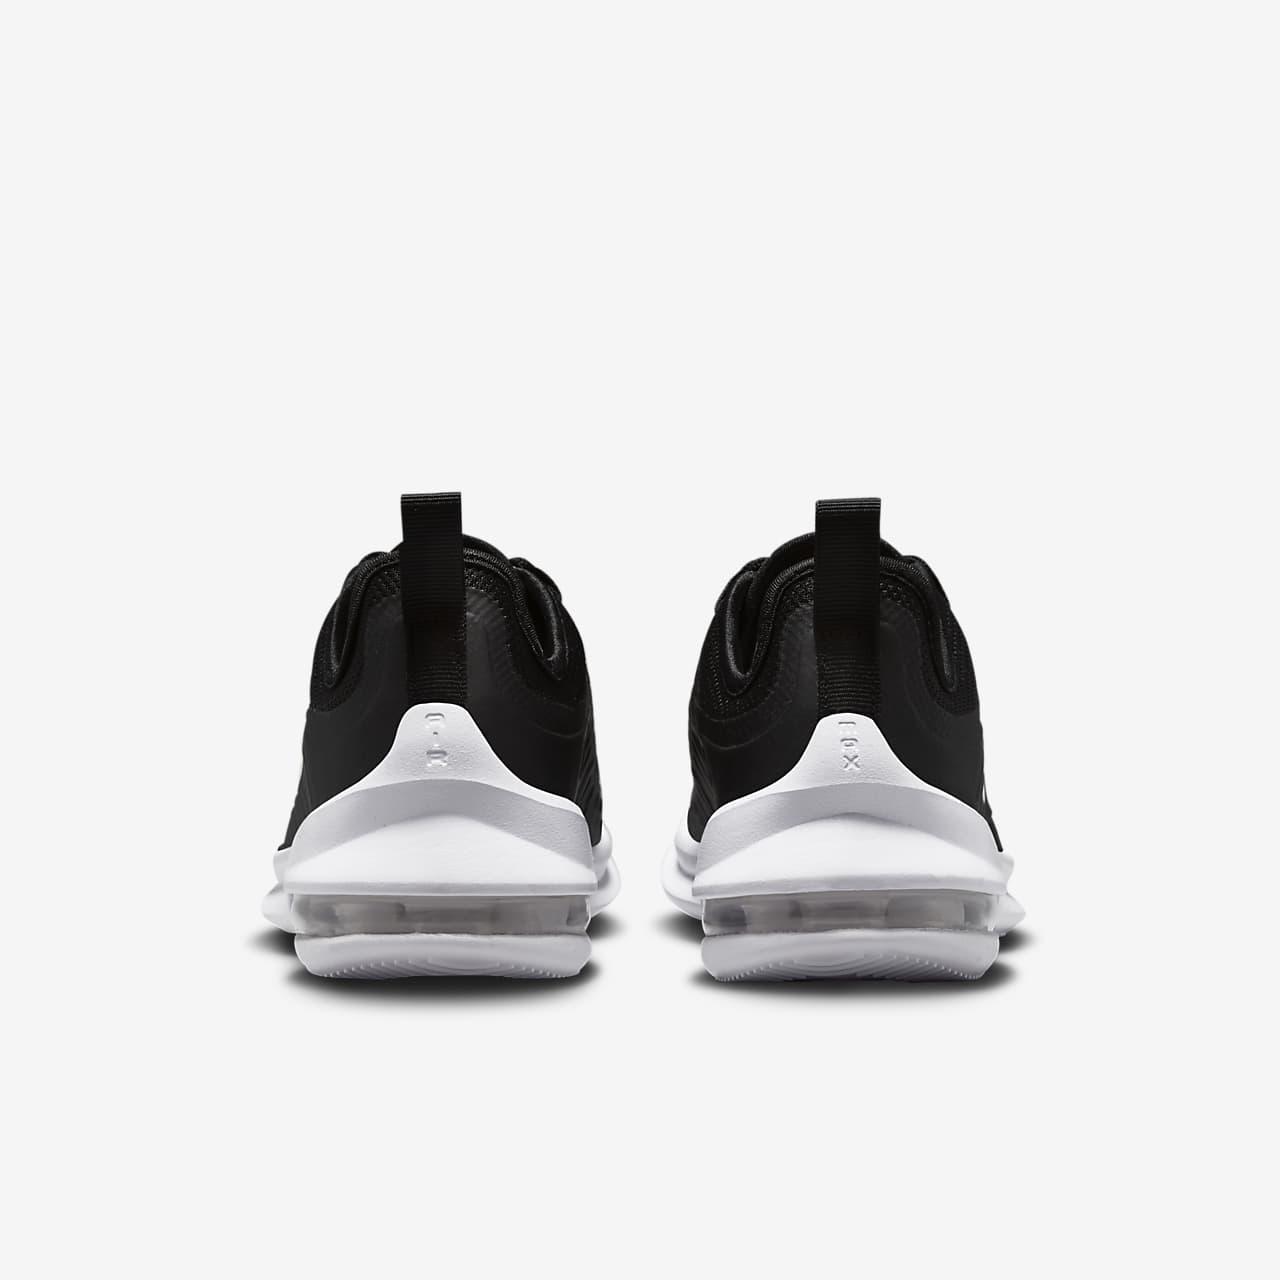 timeless design 8641e 98c49 ... Nike Air Max Axis Older Kids  Shoe